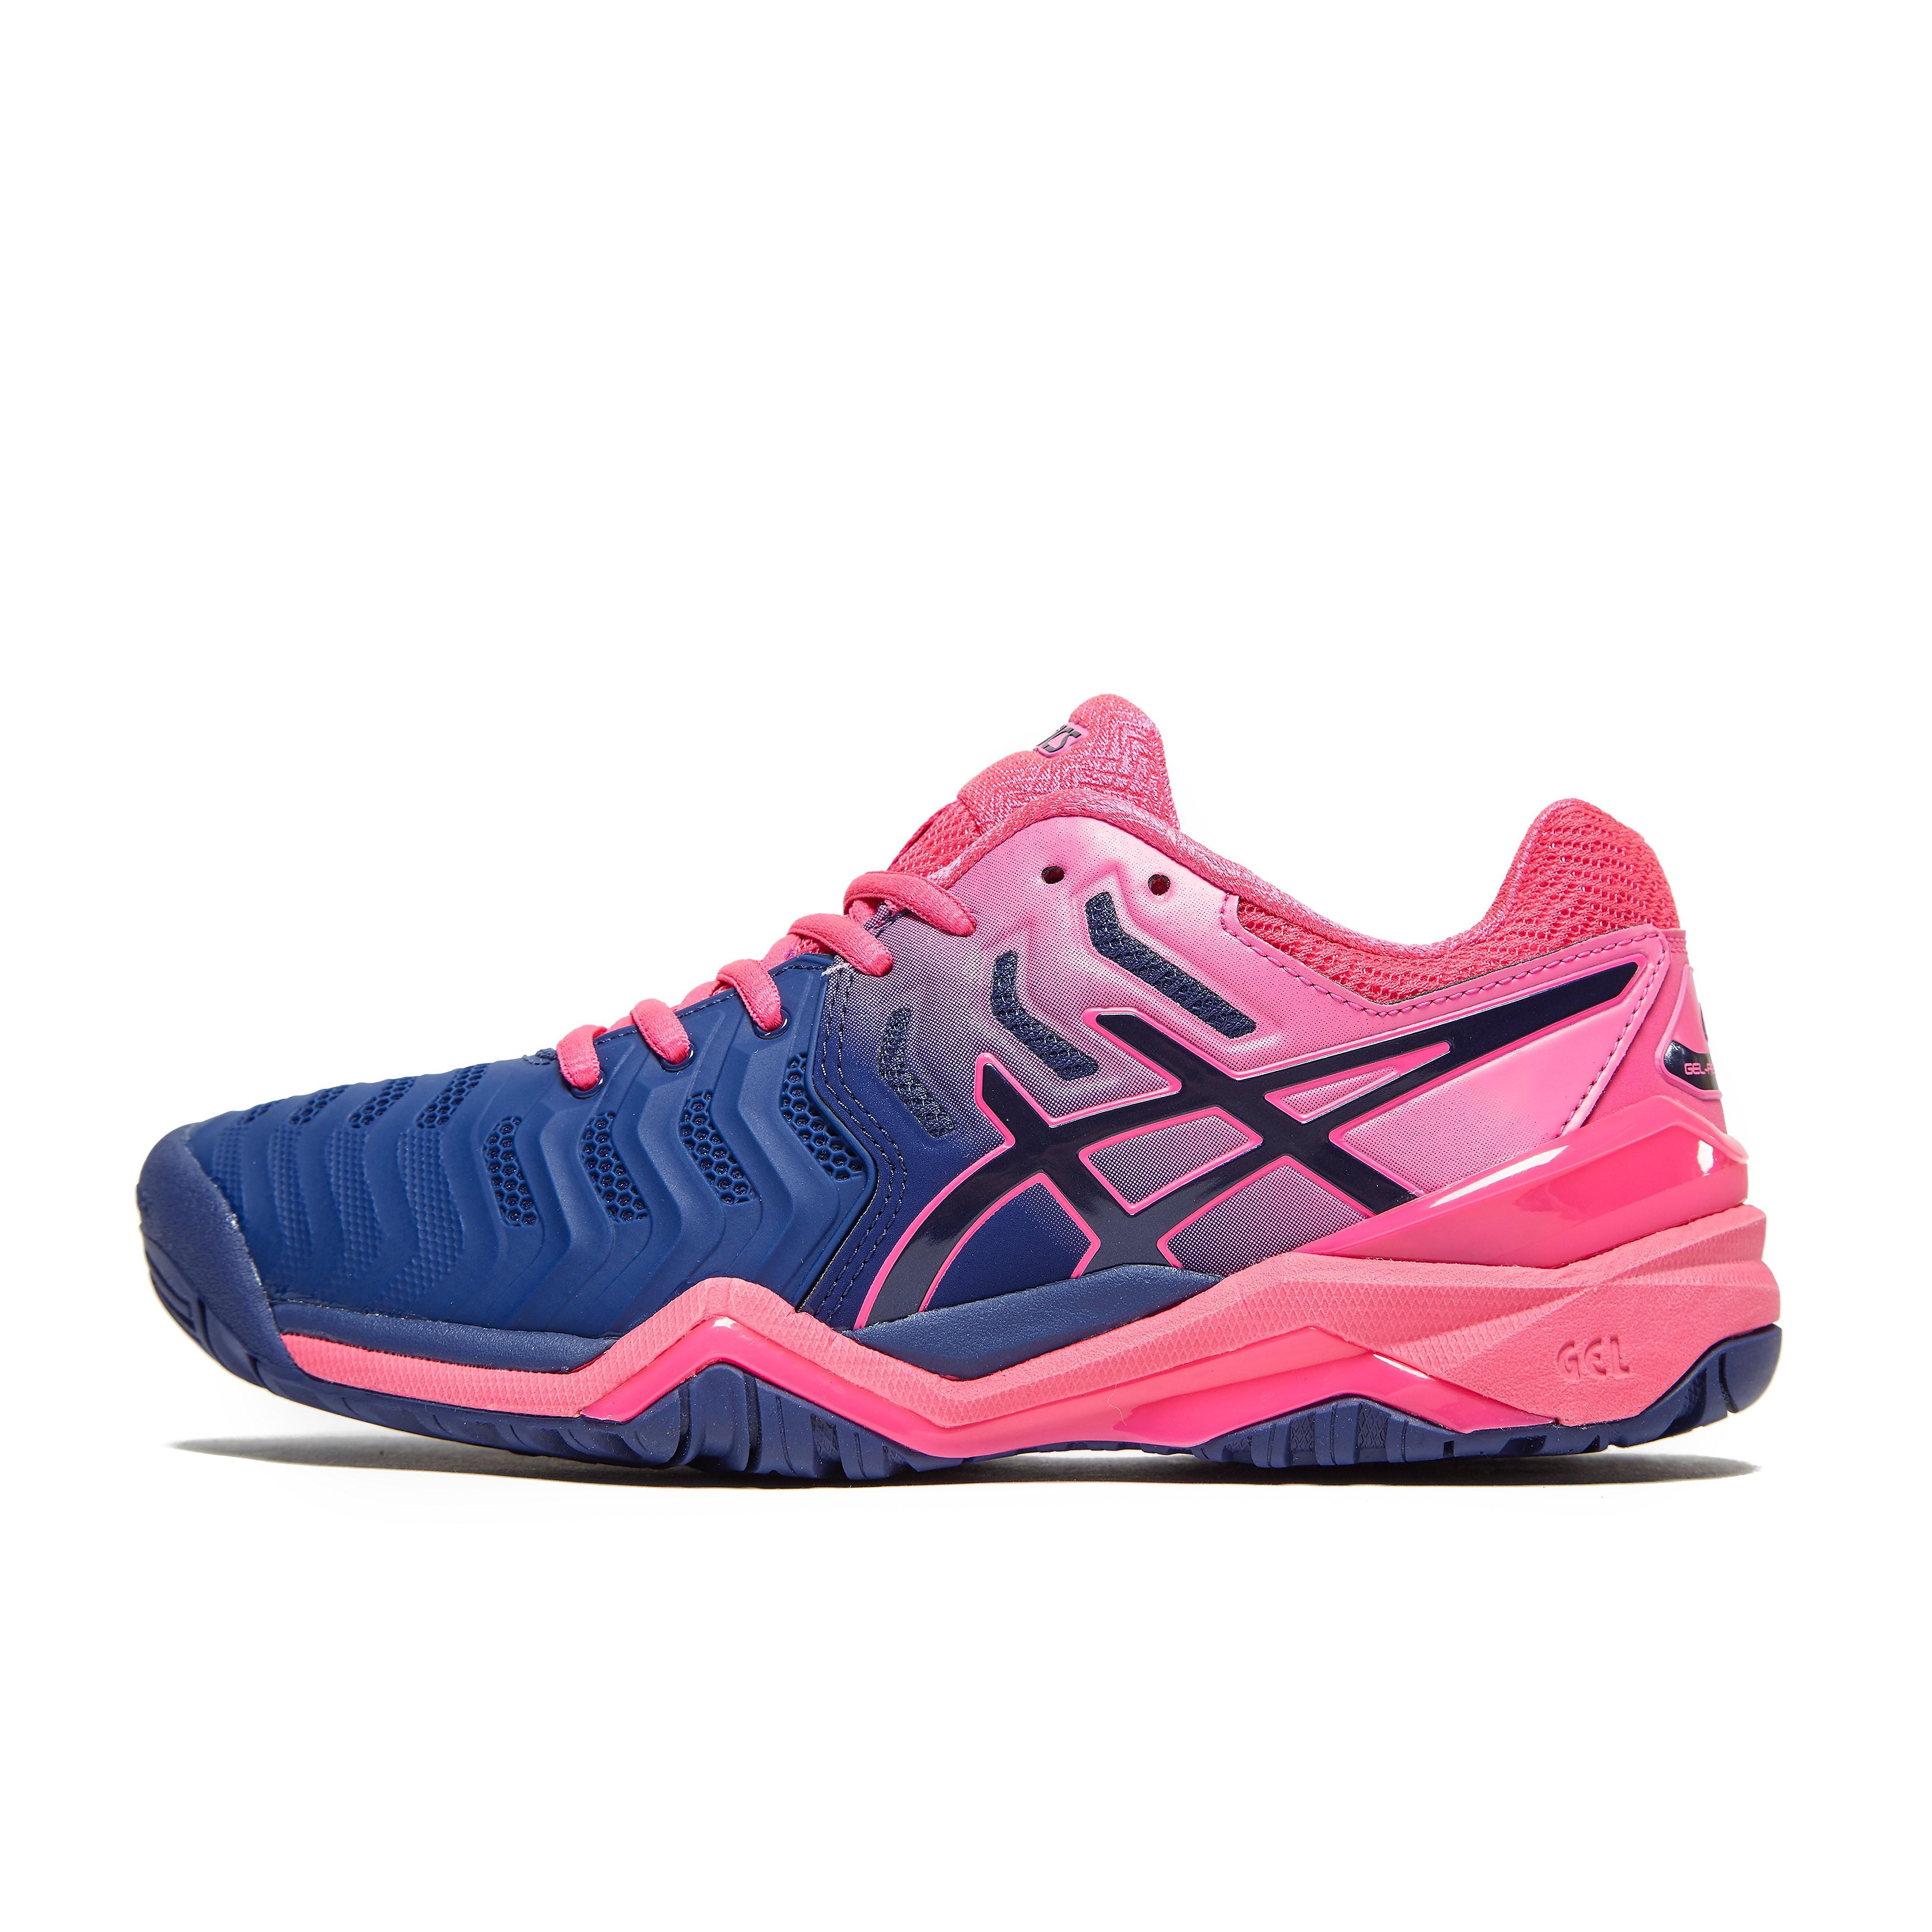 Womens Pink ASICS GEL-RESOLUTION 7 TENNIS SHOES